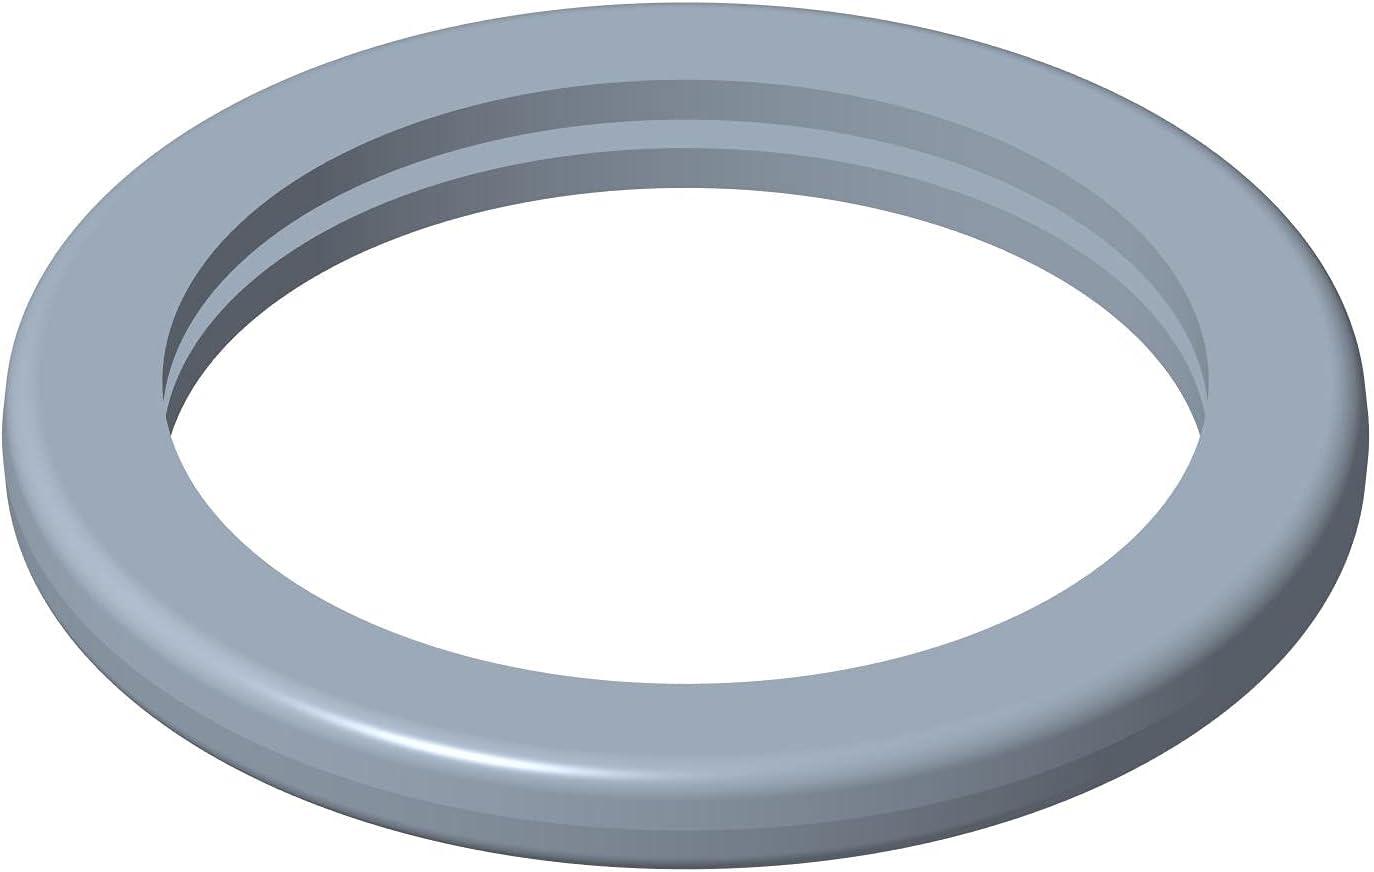 Polaris O-Ring Lip Seal, Genuine OEM Part 5411521, Qty 1